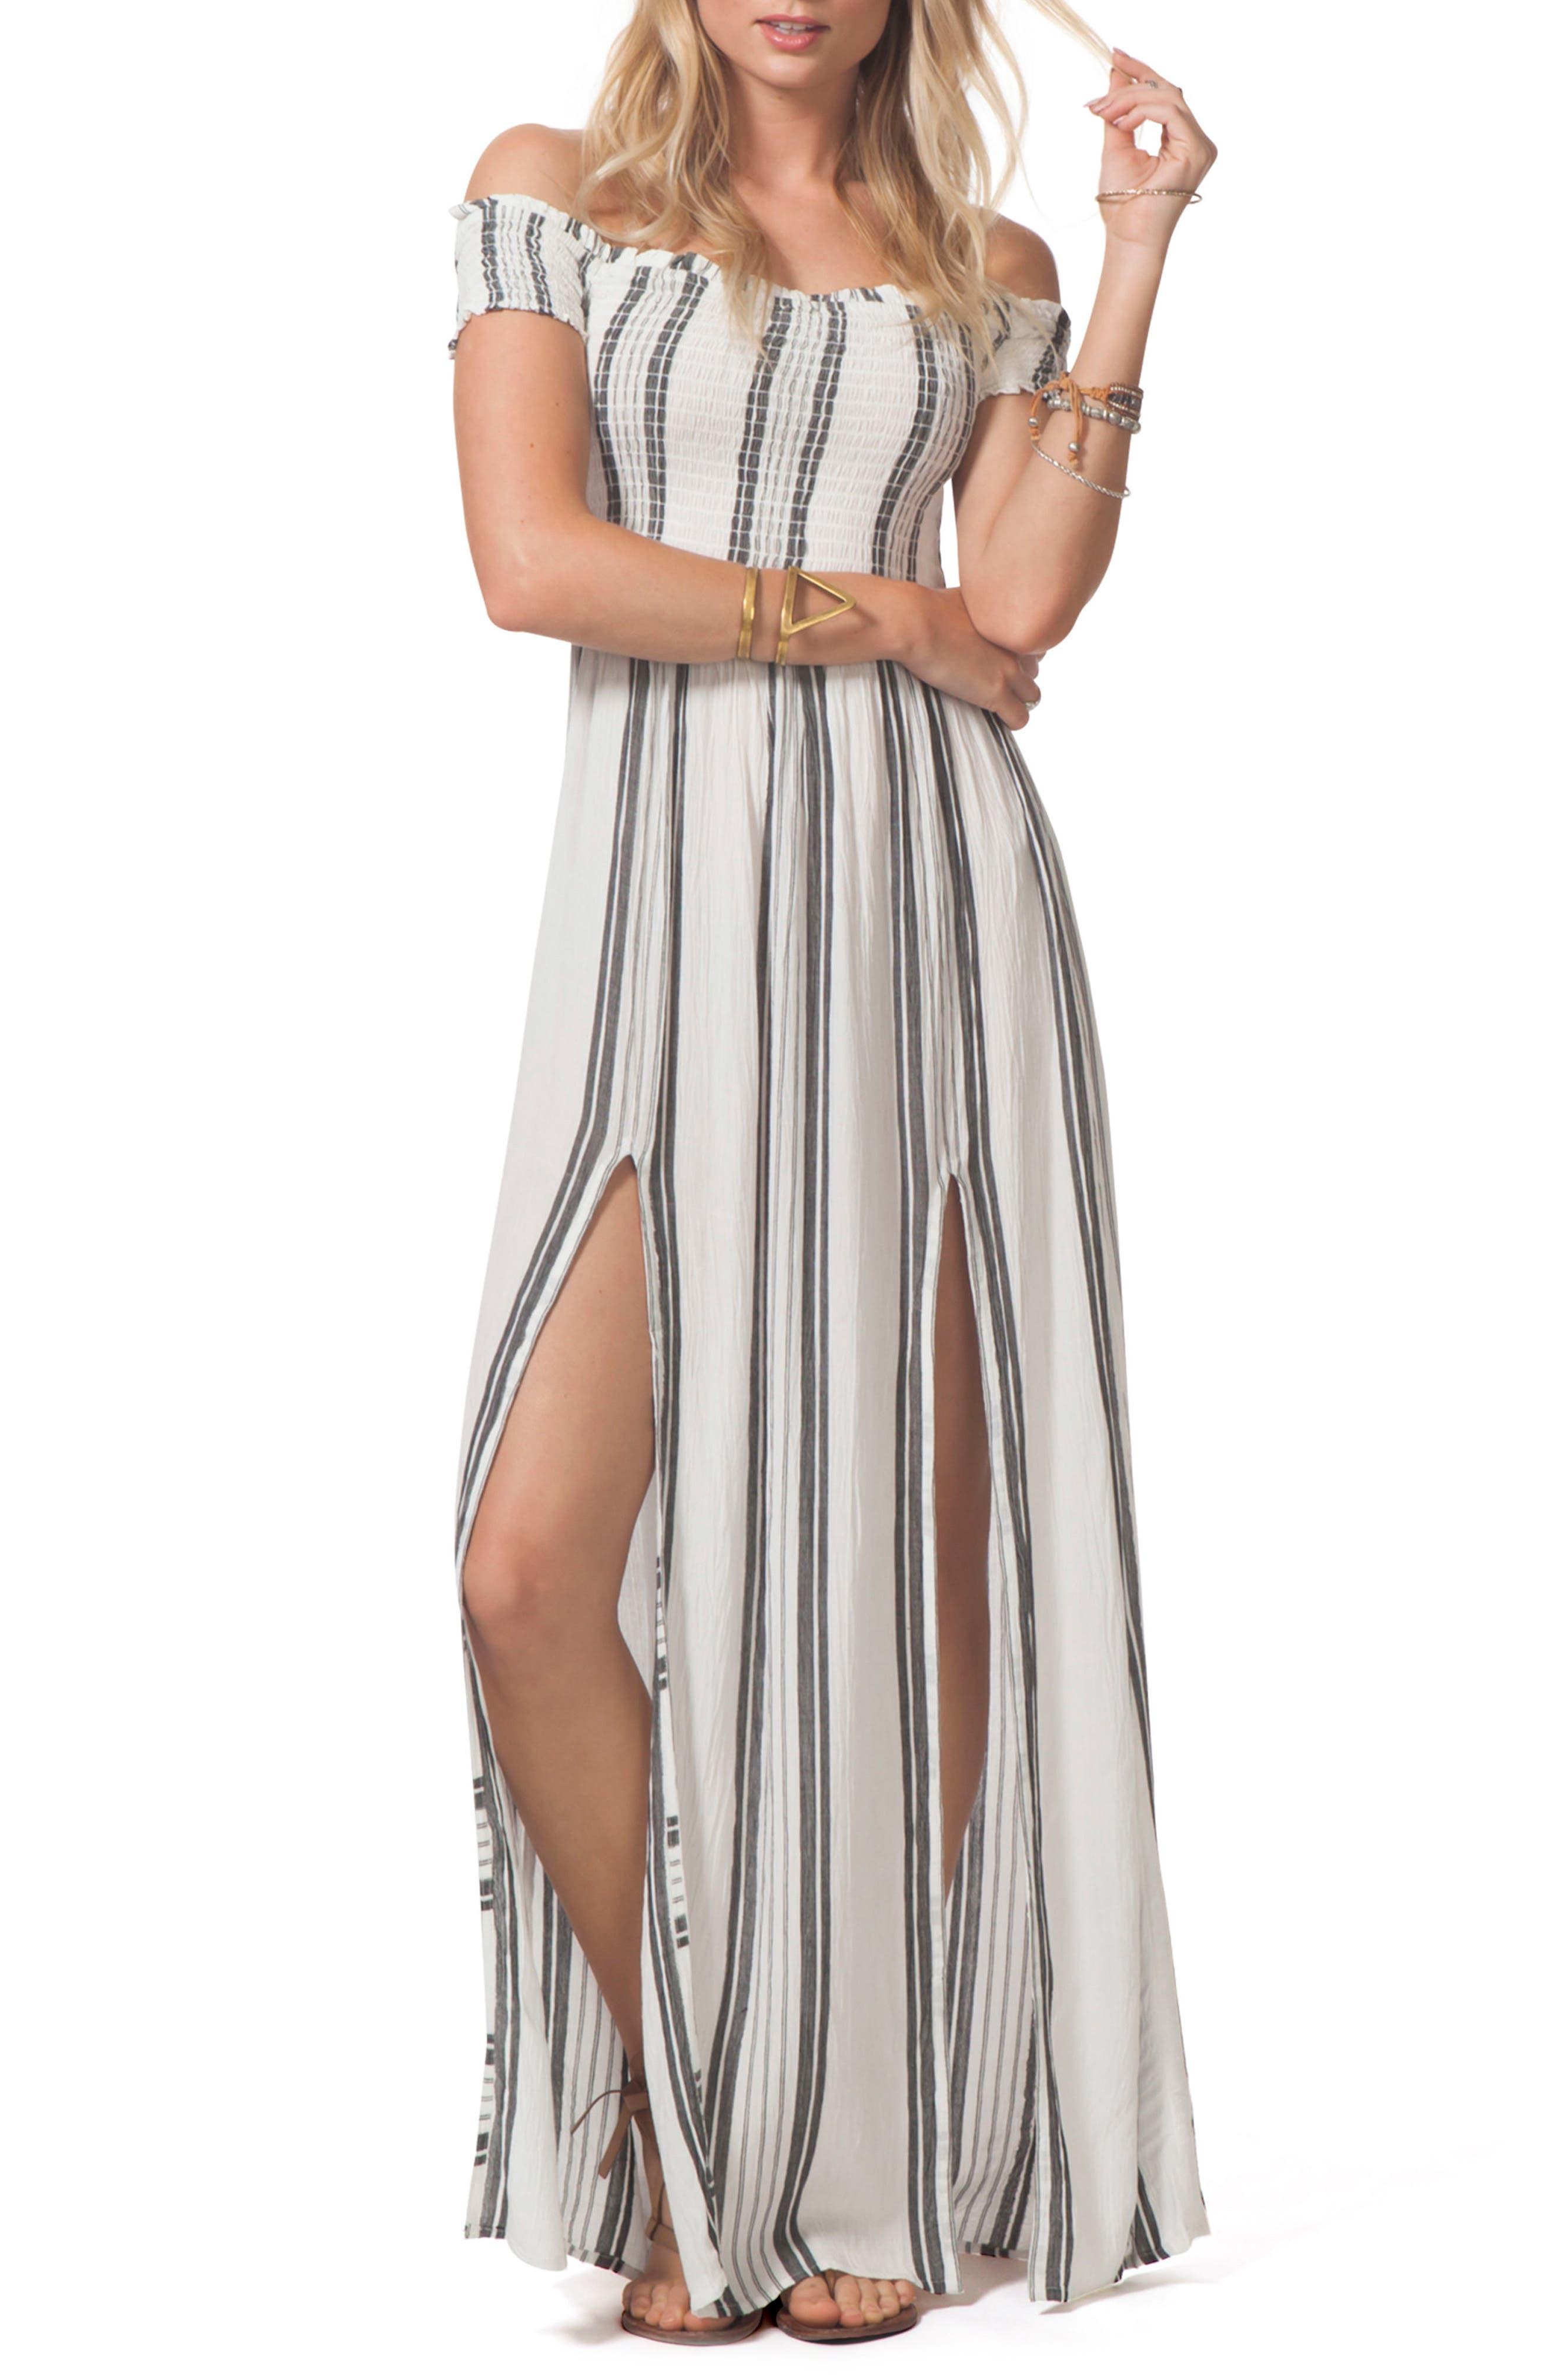 Soulmate Off the Shoulder Maxi Dress,                         Main,                         color, 100